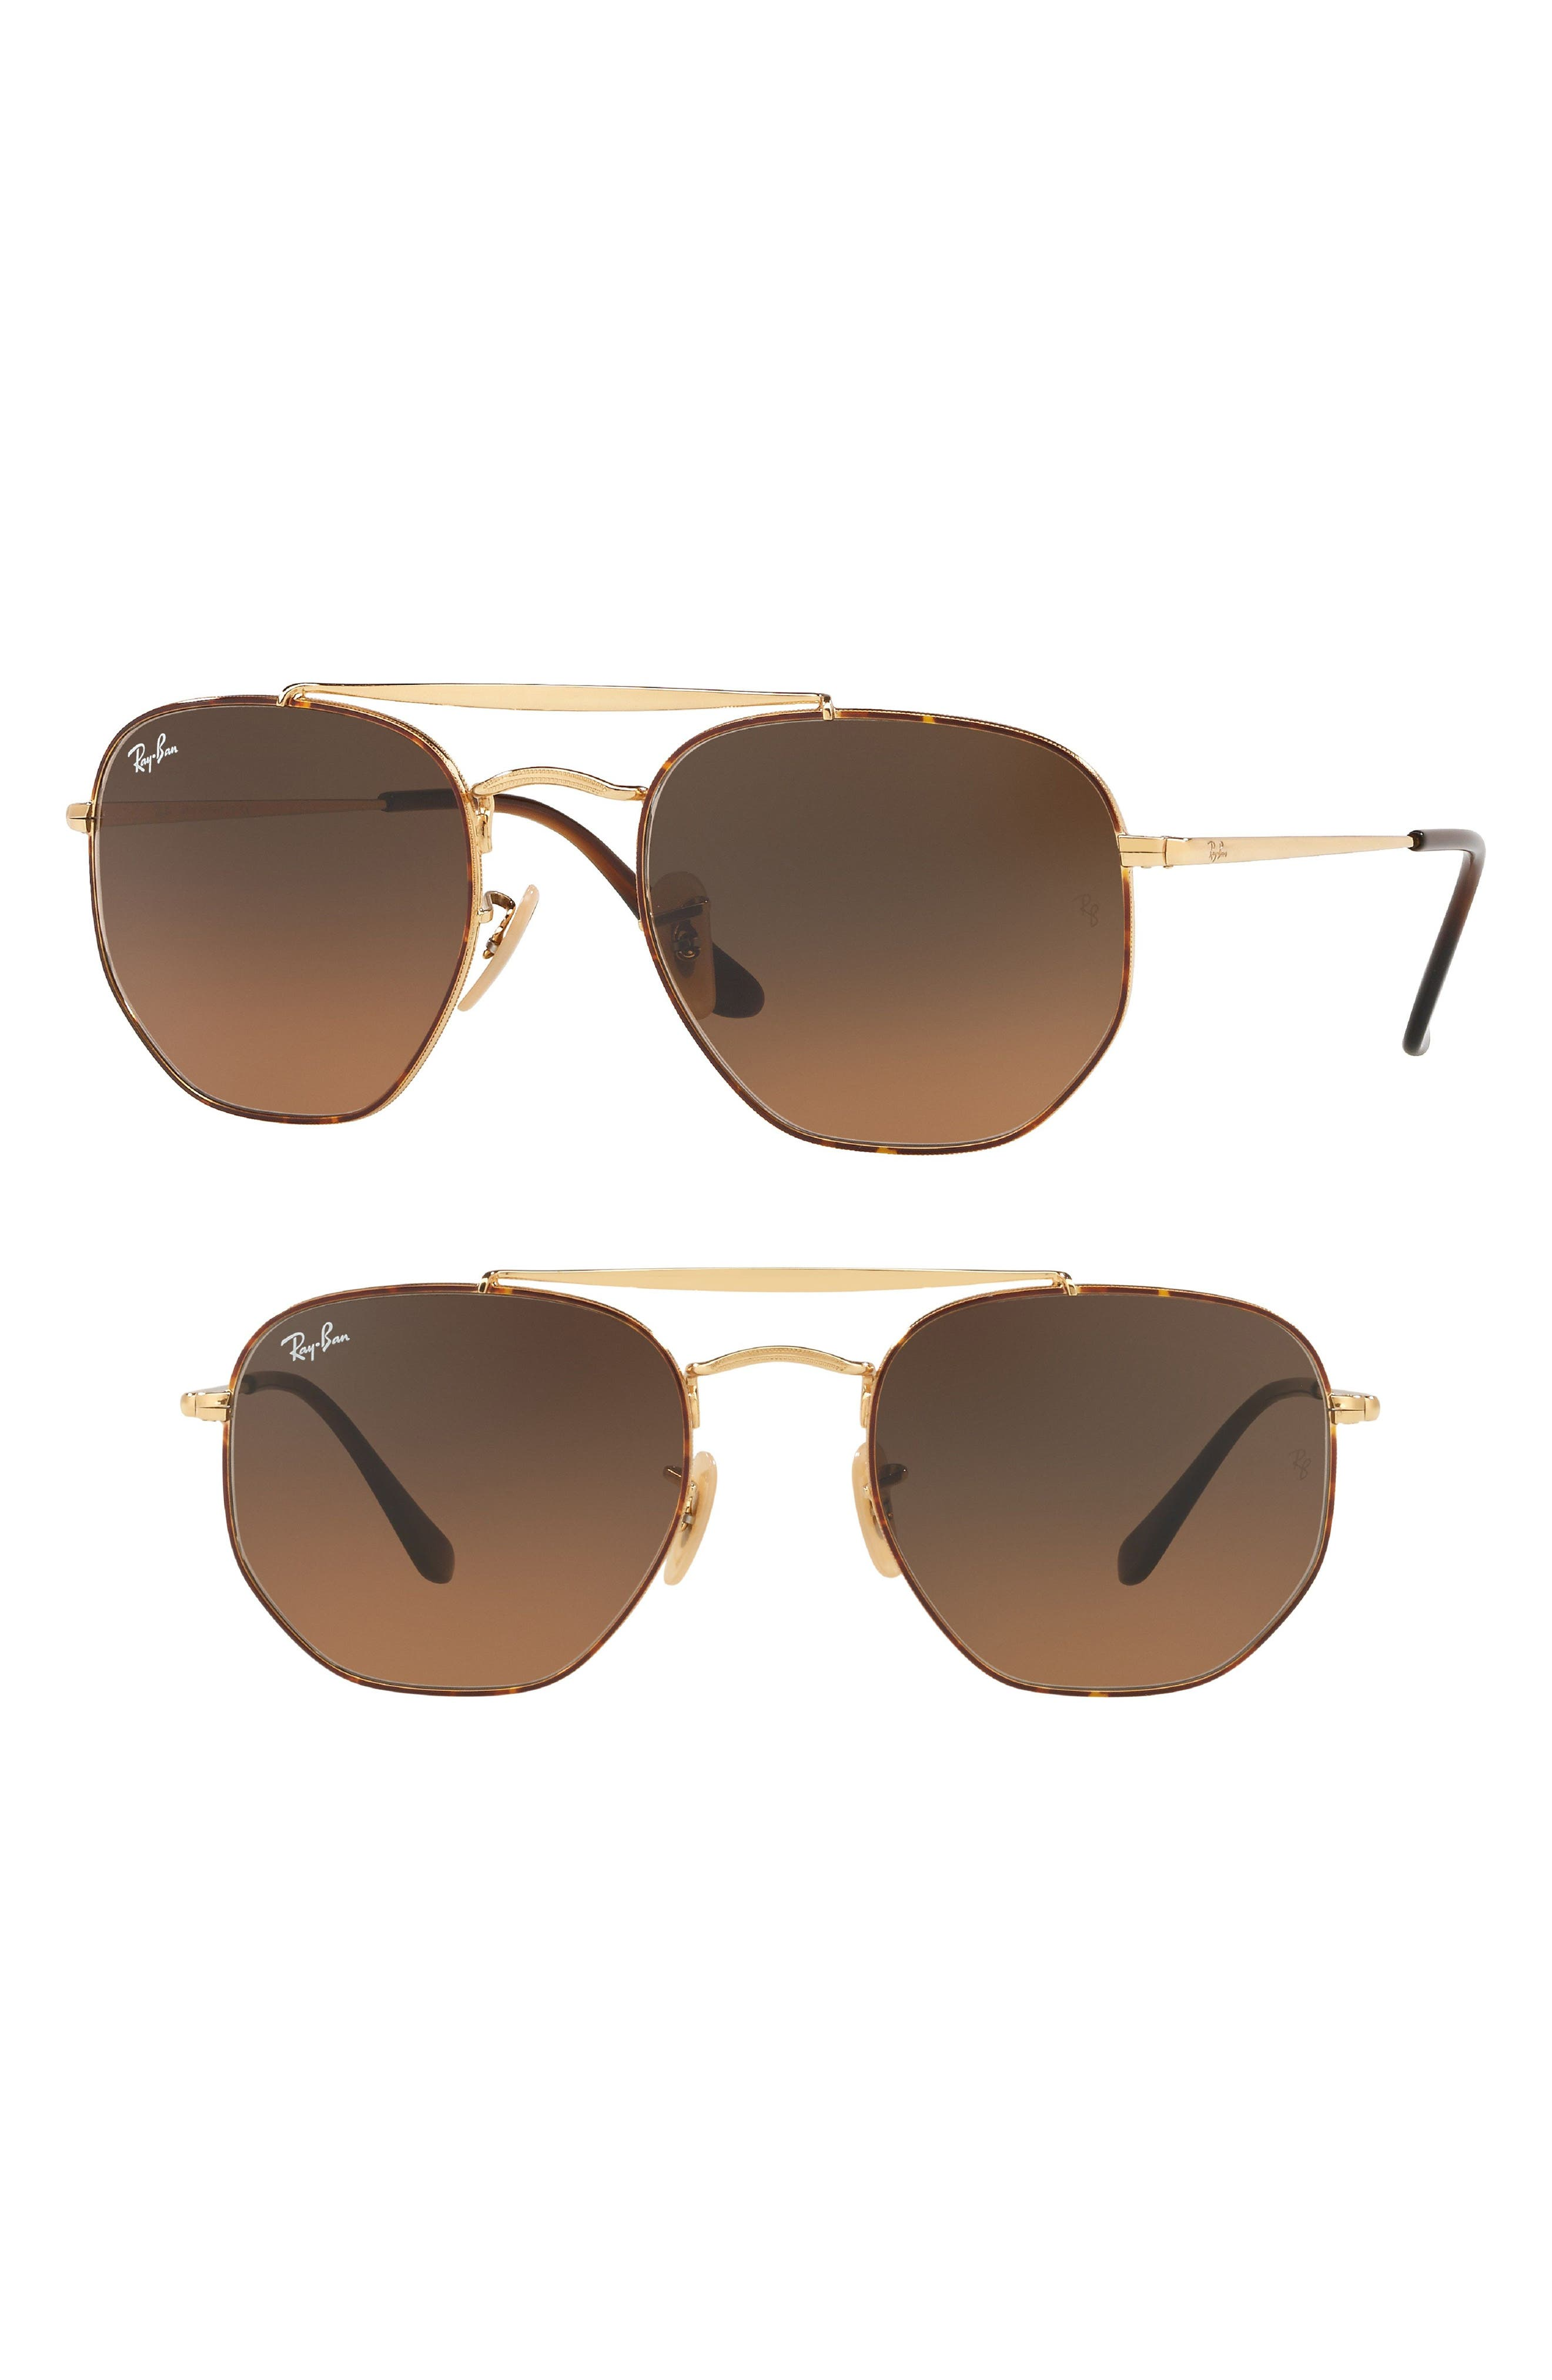 54mm Gradient Sunglasses,                         Main,                         color, Havana Gradient